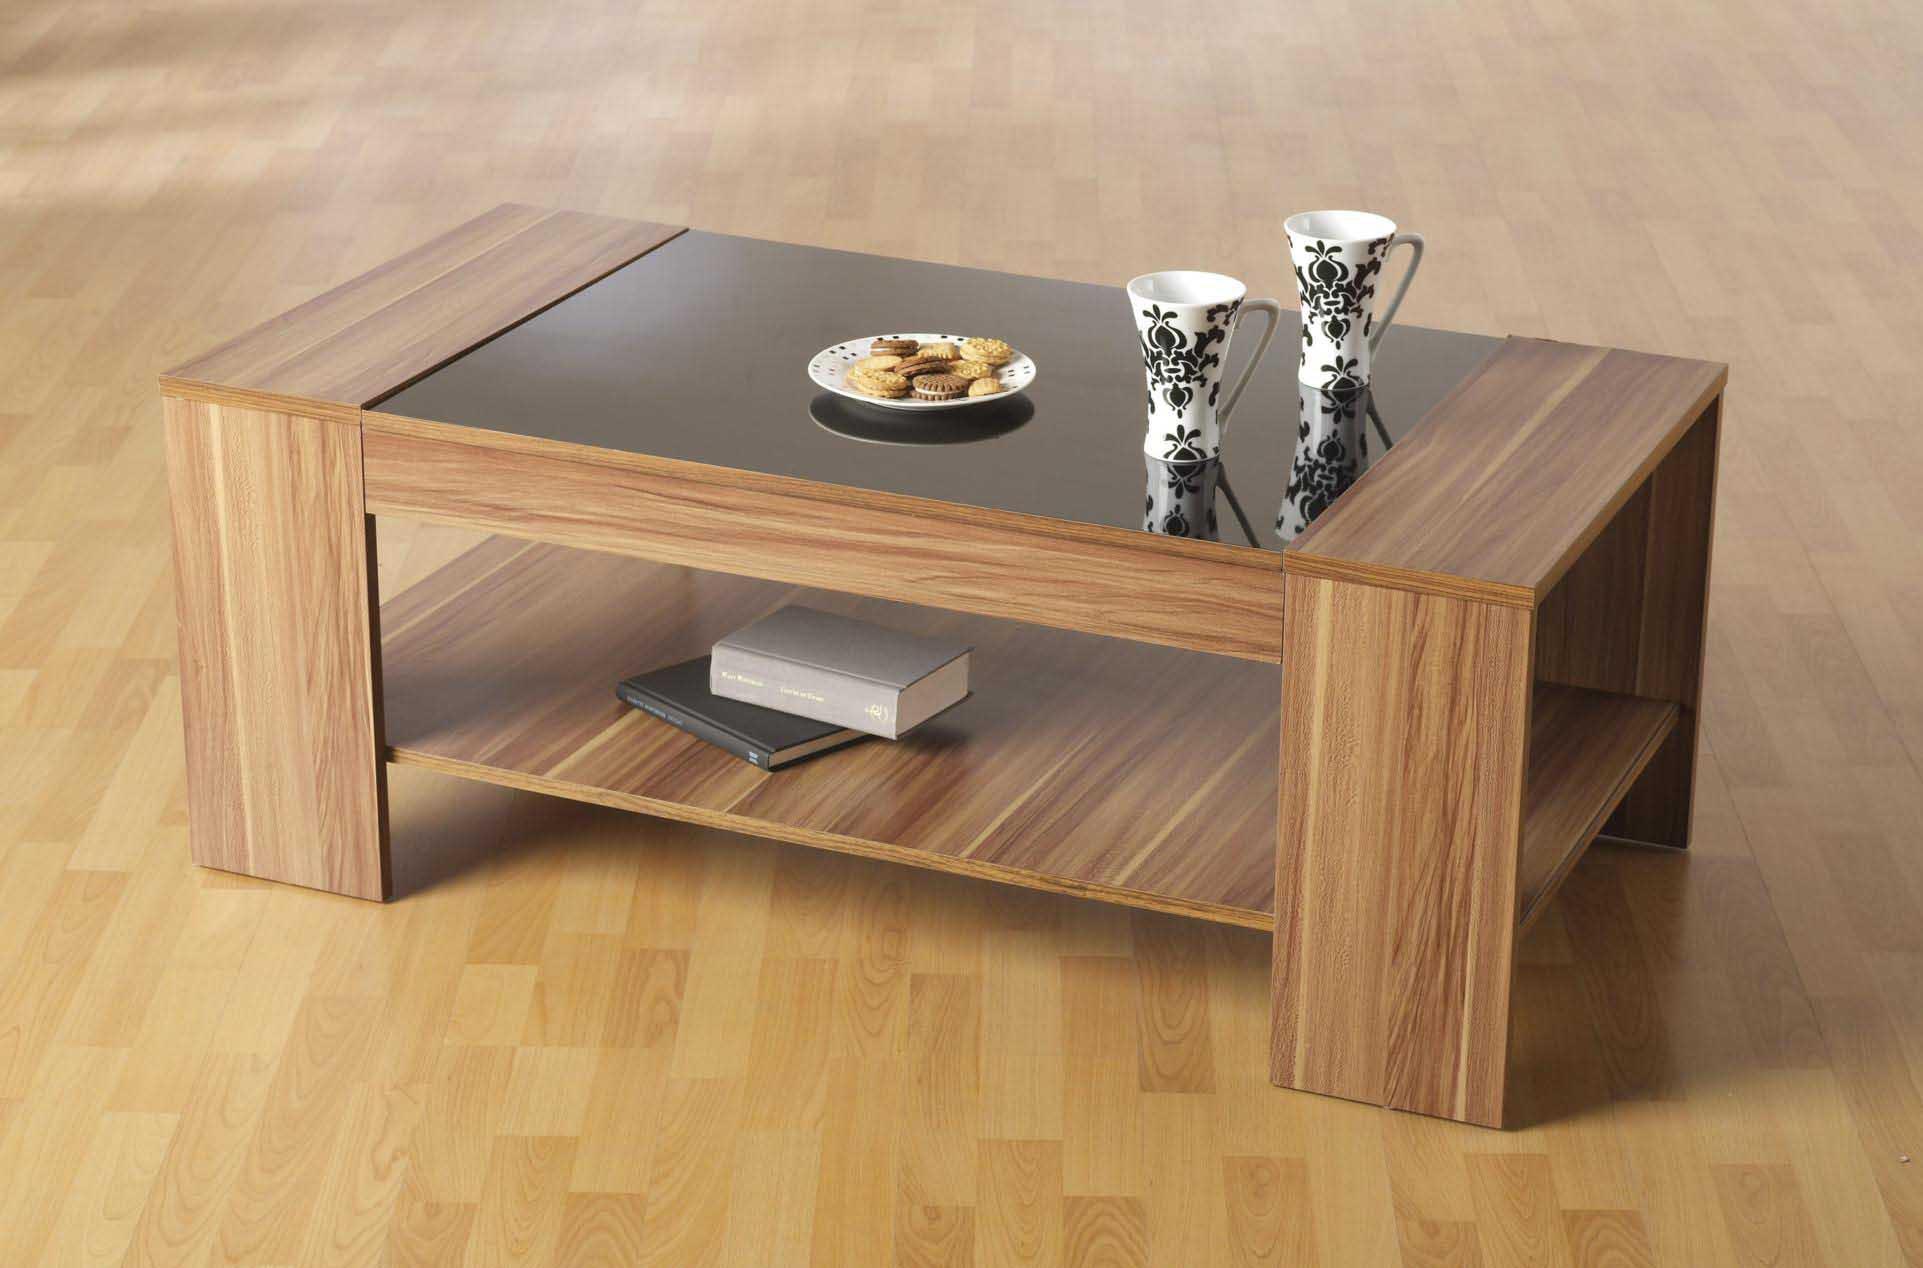 Minimalistic Coffee Table Style